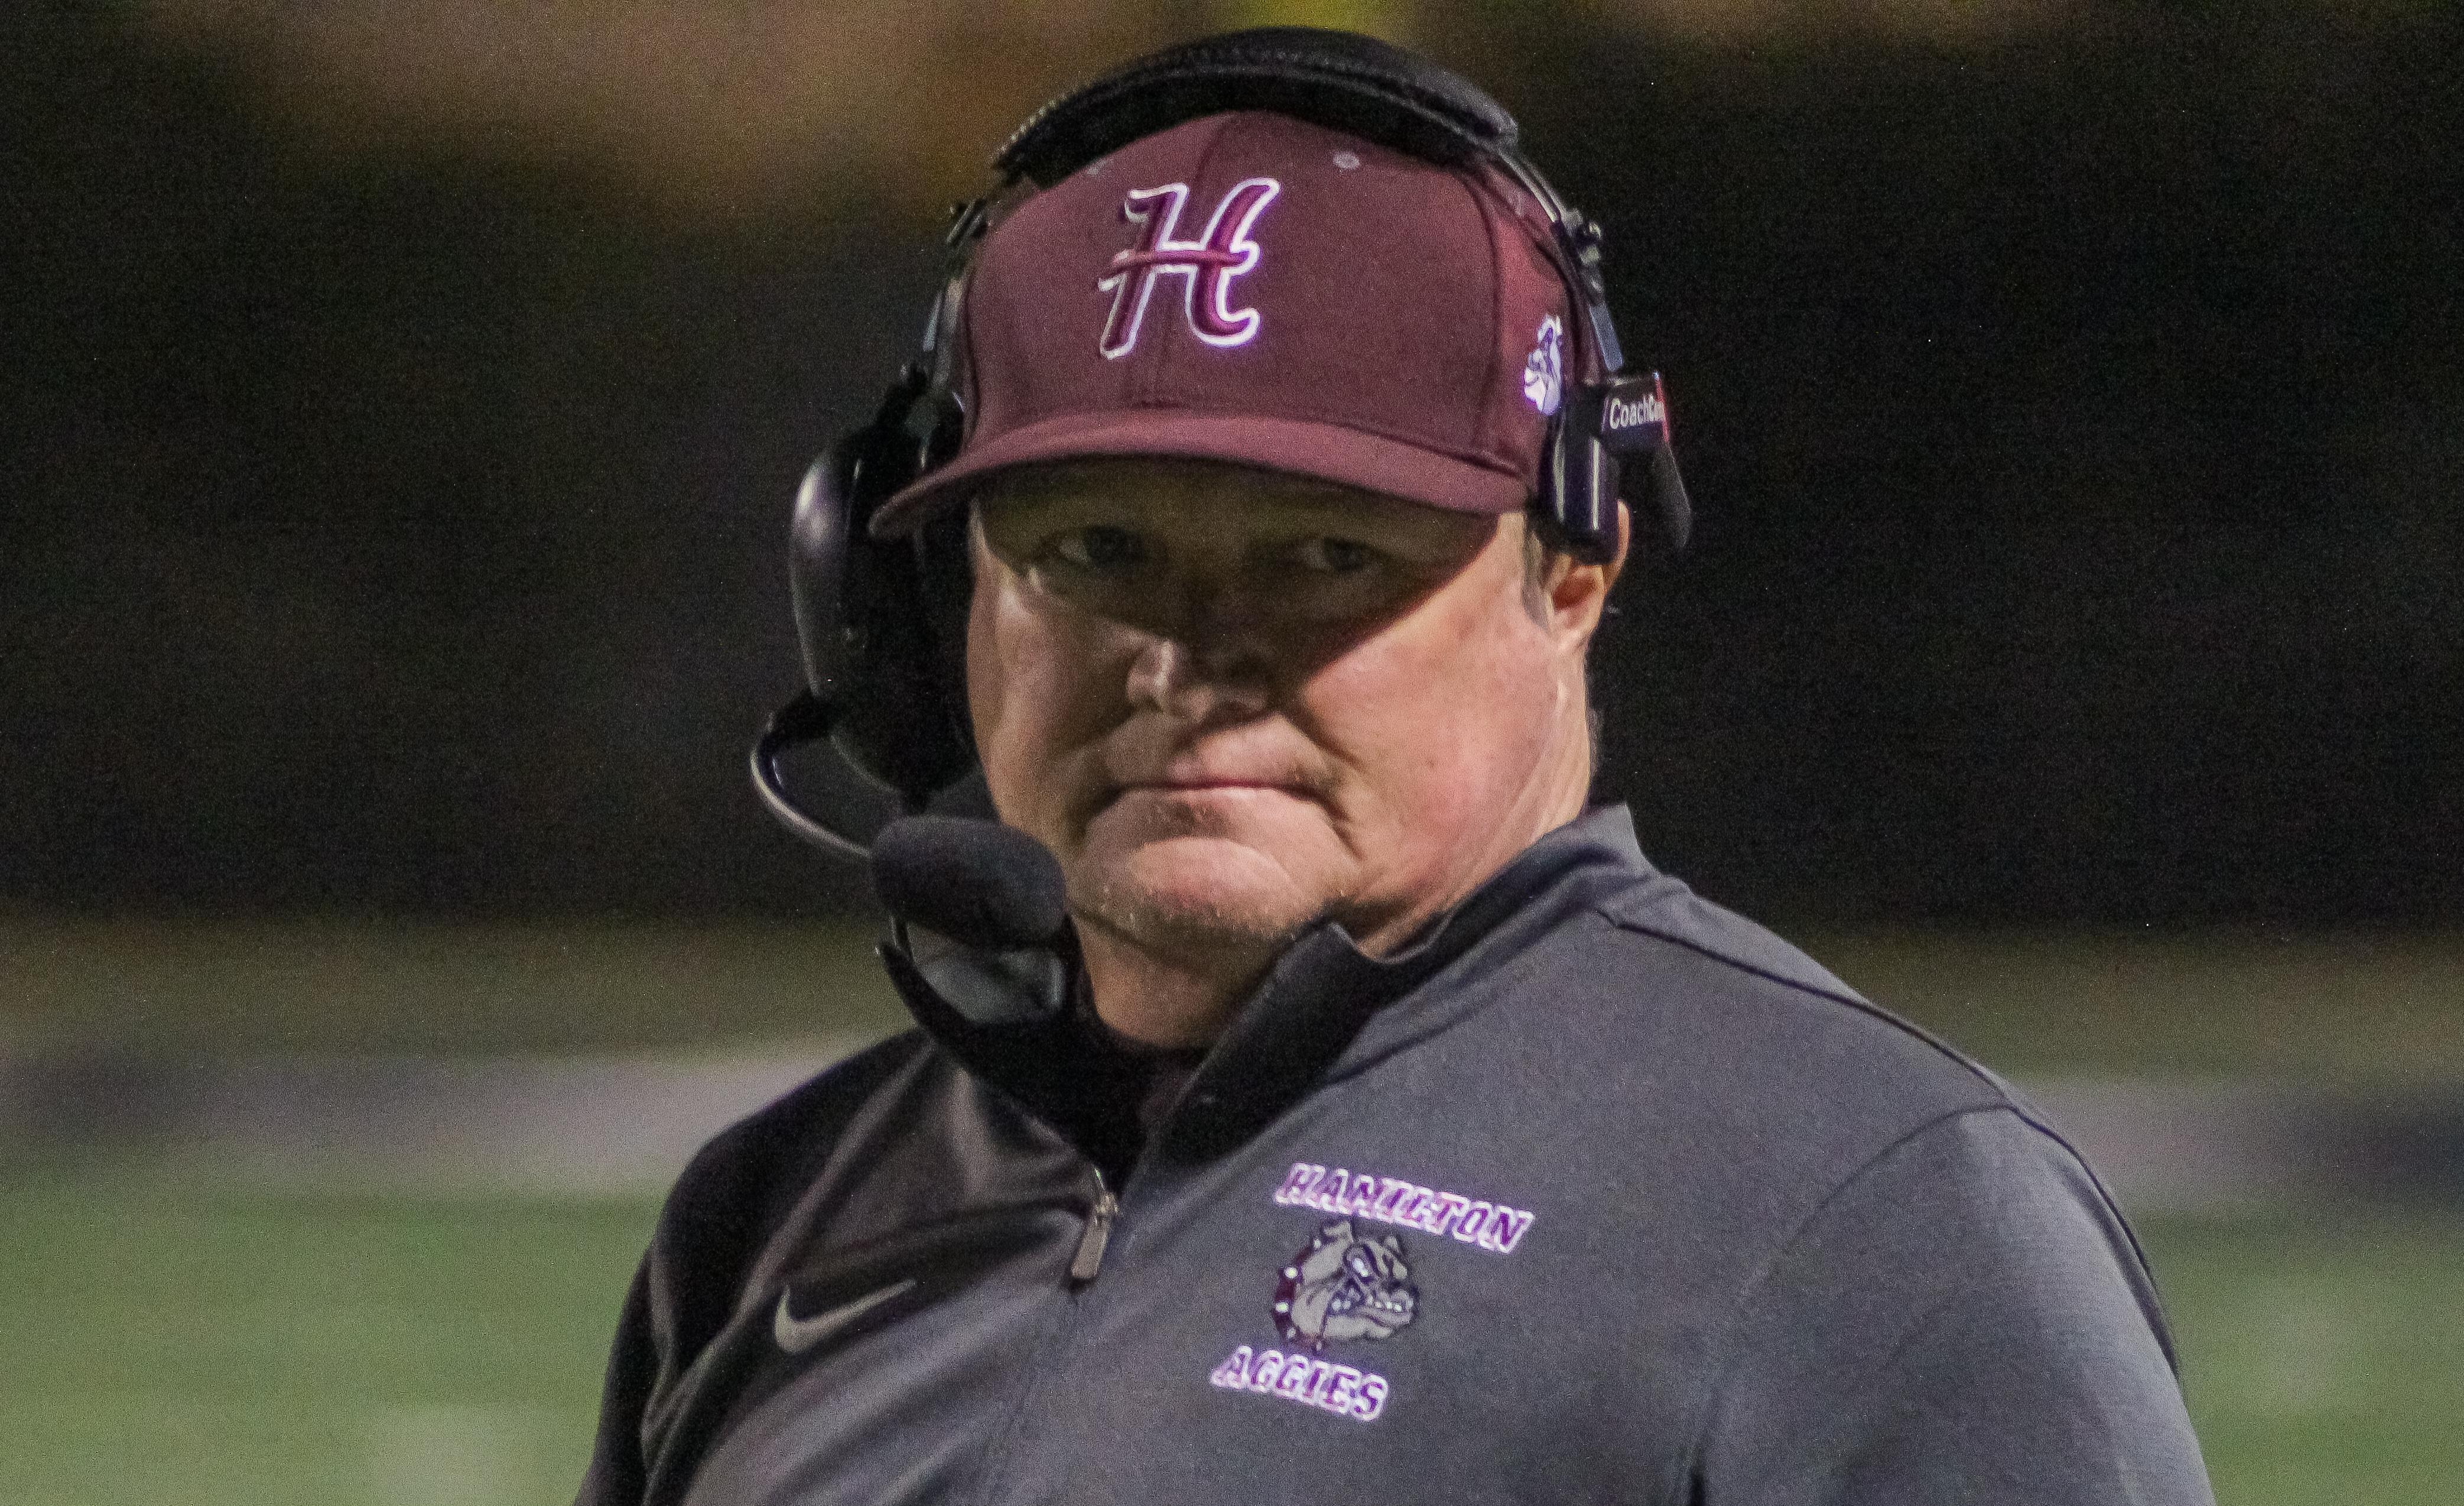 Hamilton head coach Rodney Stidham